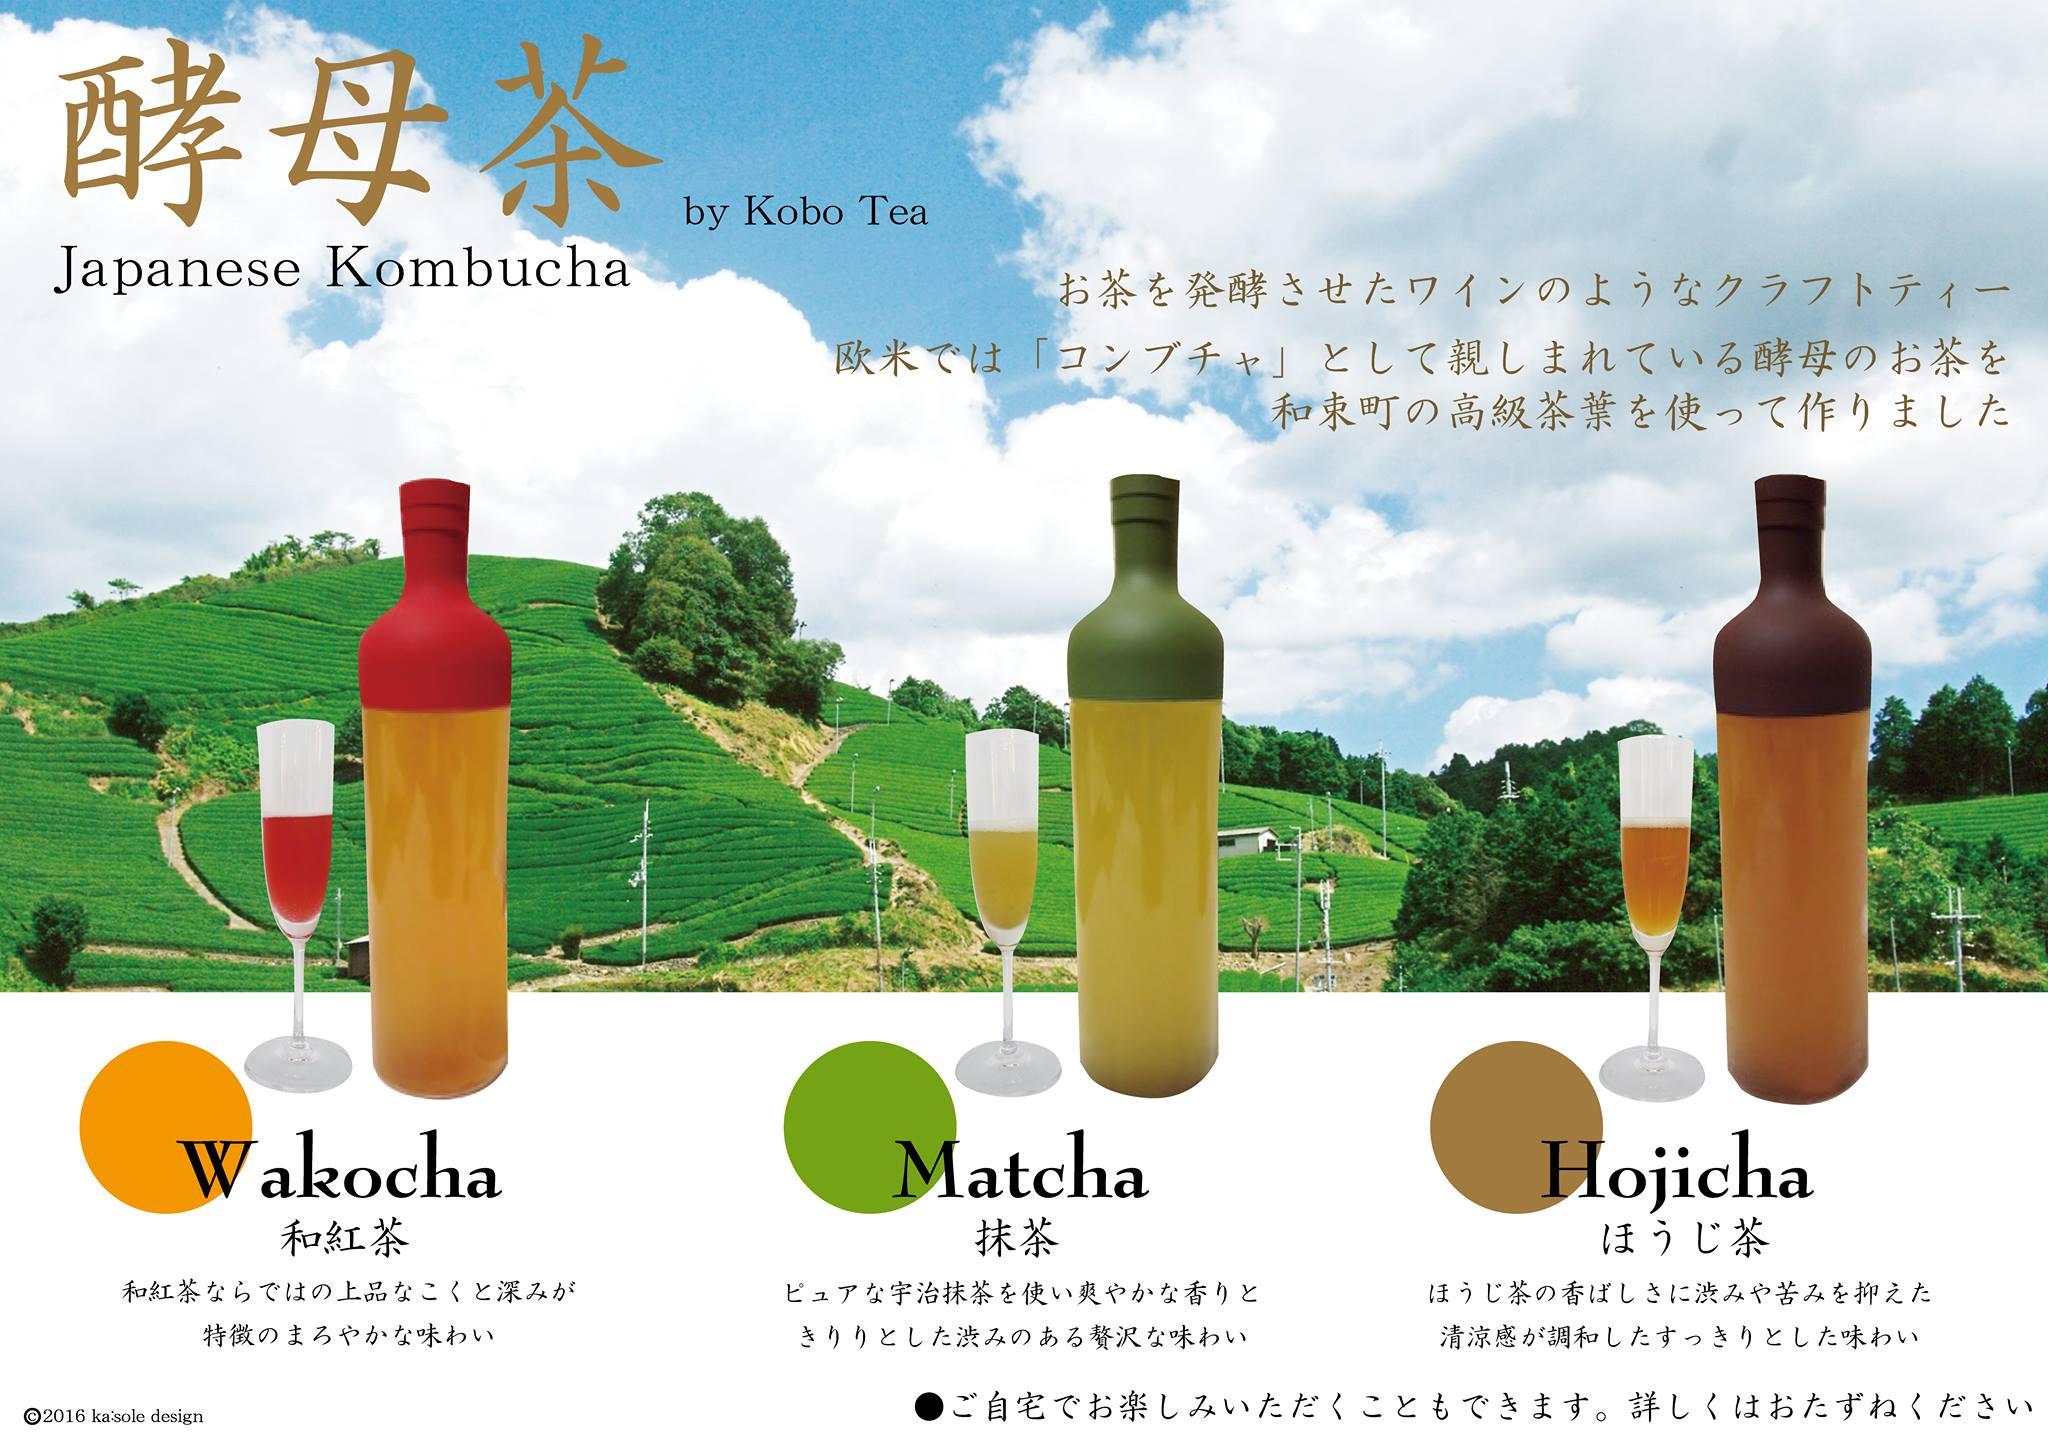 <!--:ja-->酵母茶 by Kobo Tea<!--:-->